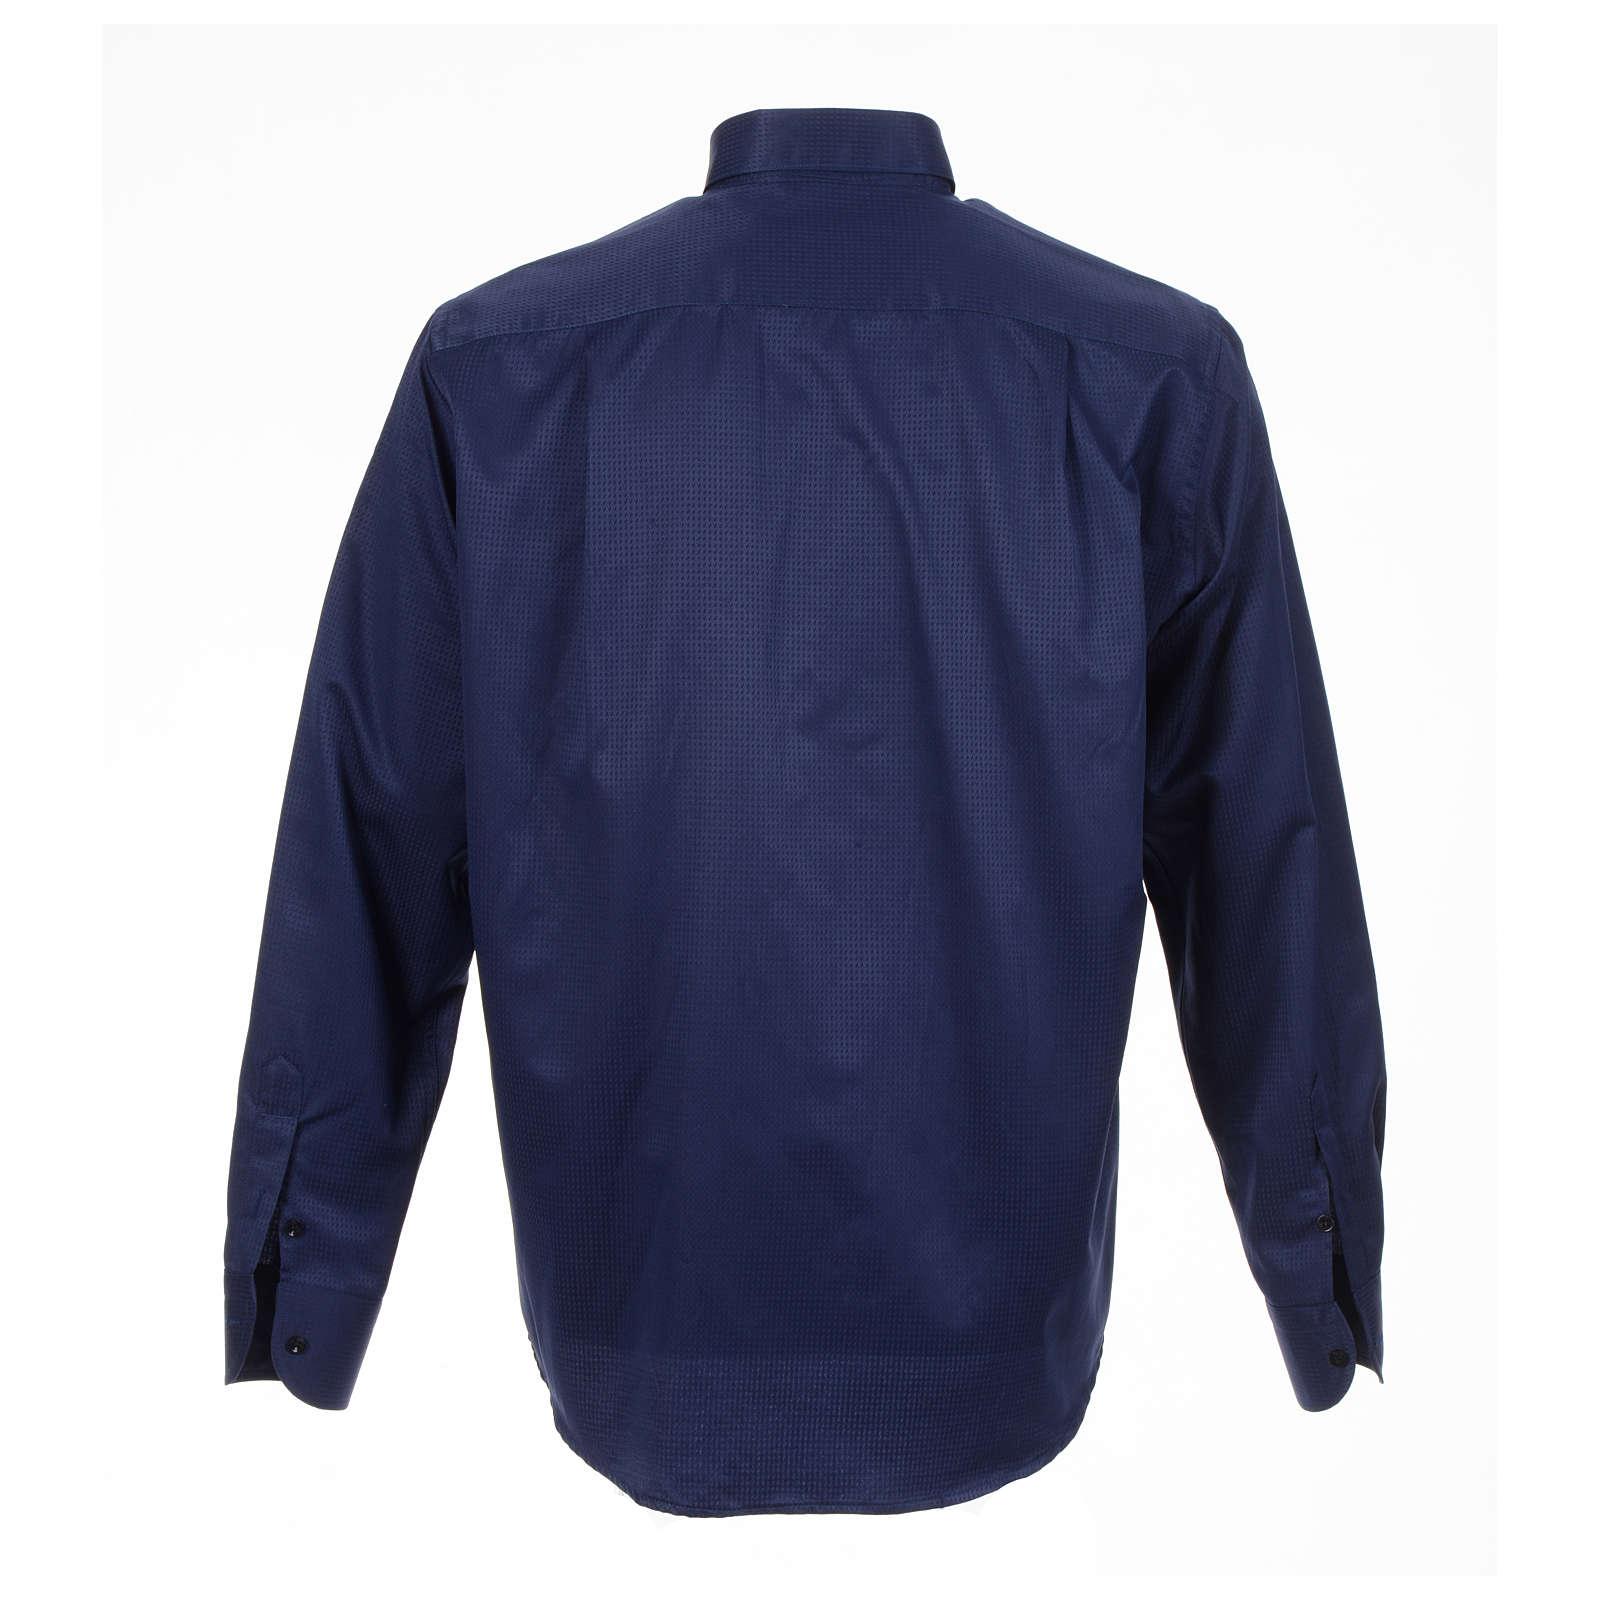 Clerical shirt blue jacquard long sleeve 4